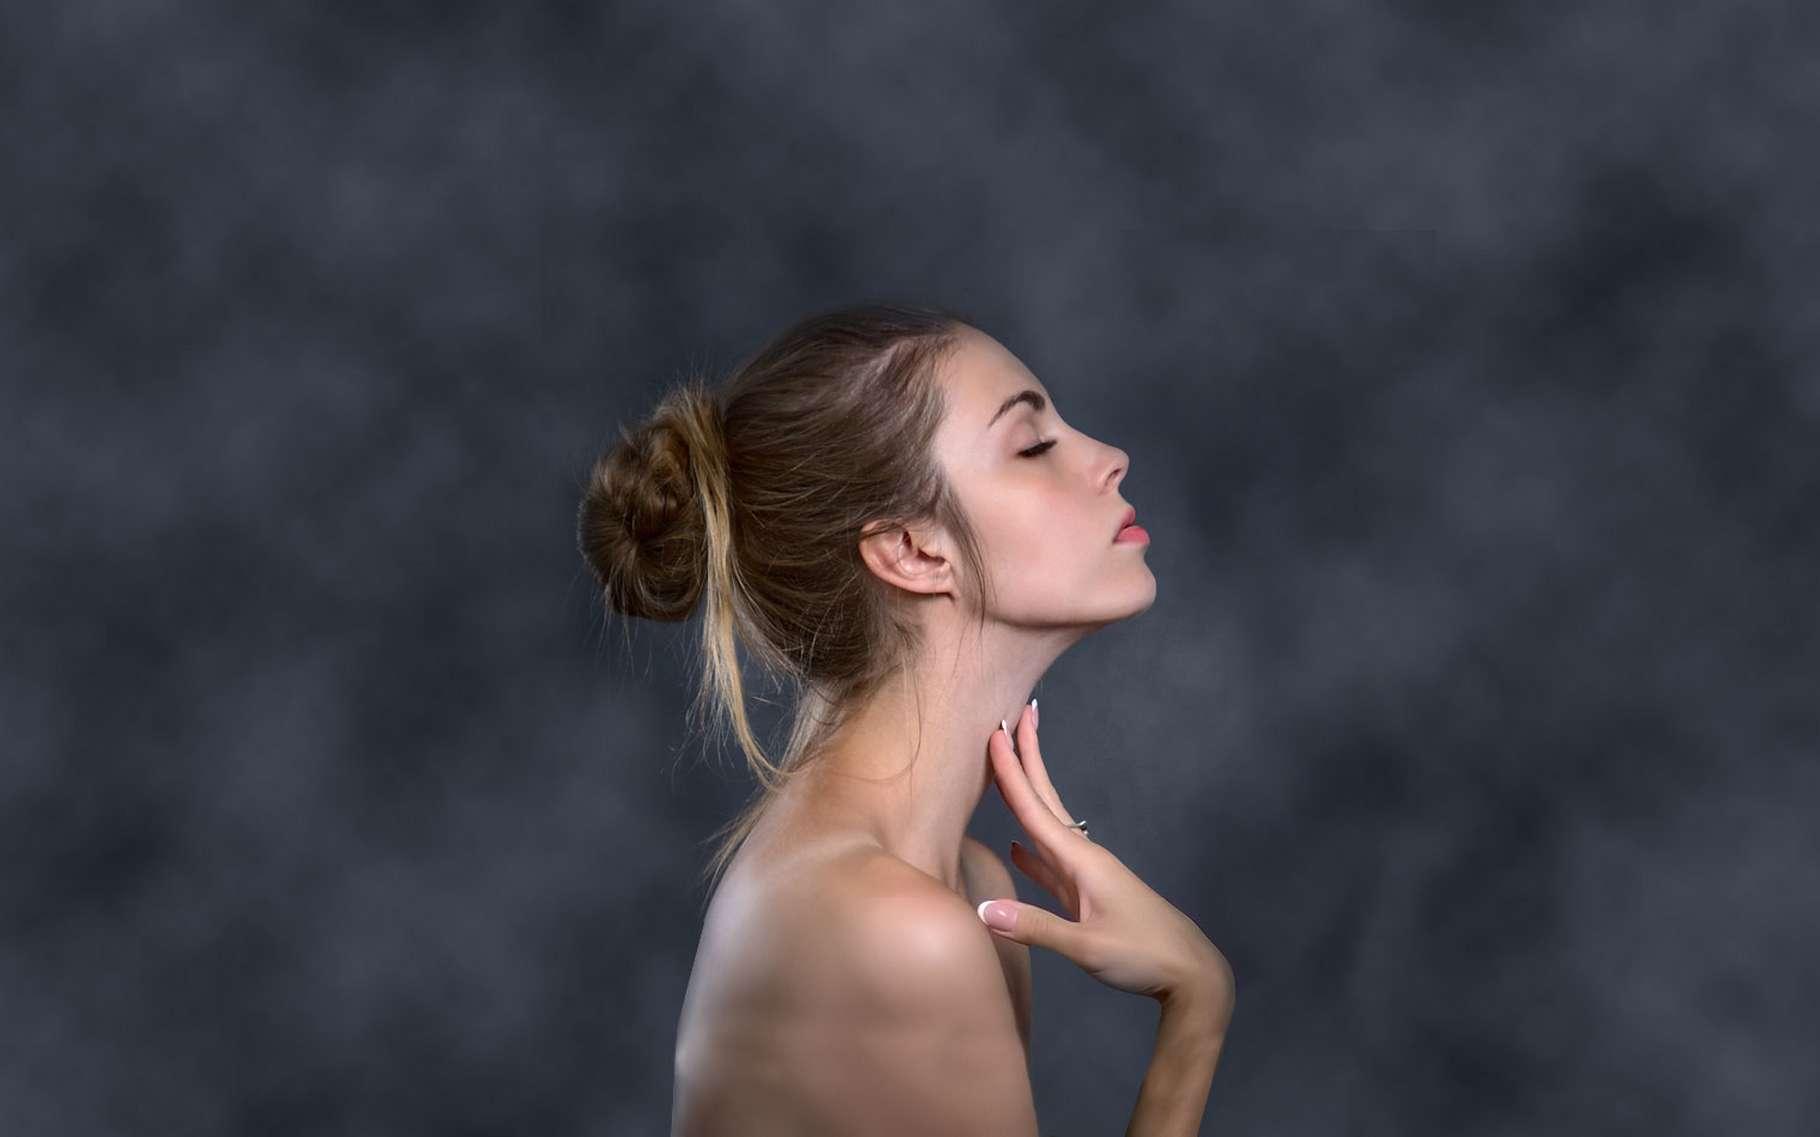 Pour ou contre le lifting cervico-facial ? © JerzyGorecki, Pixabay, DP